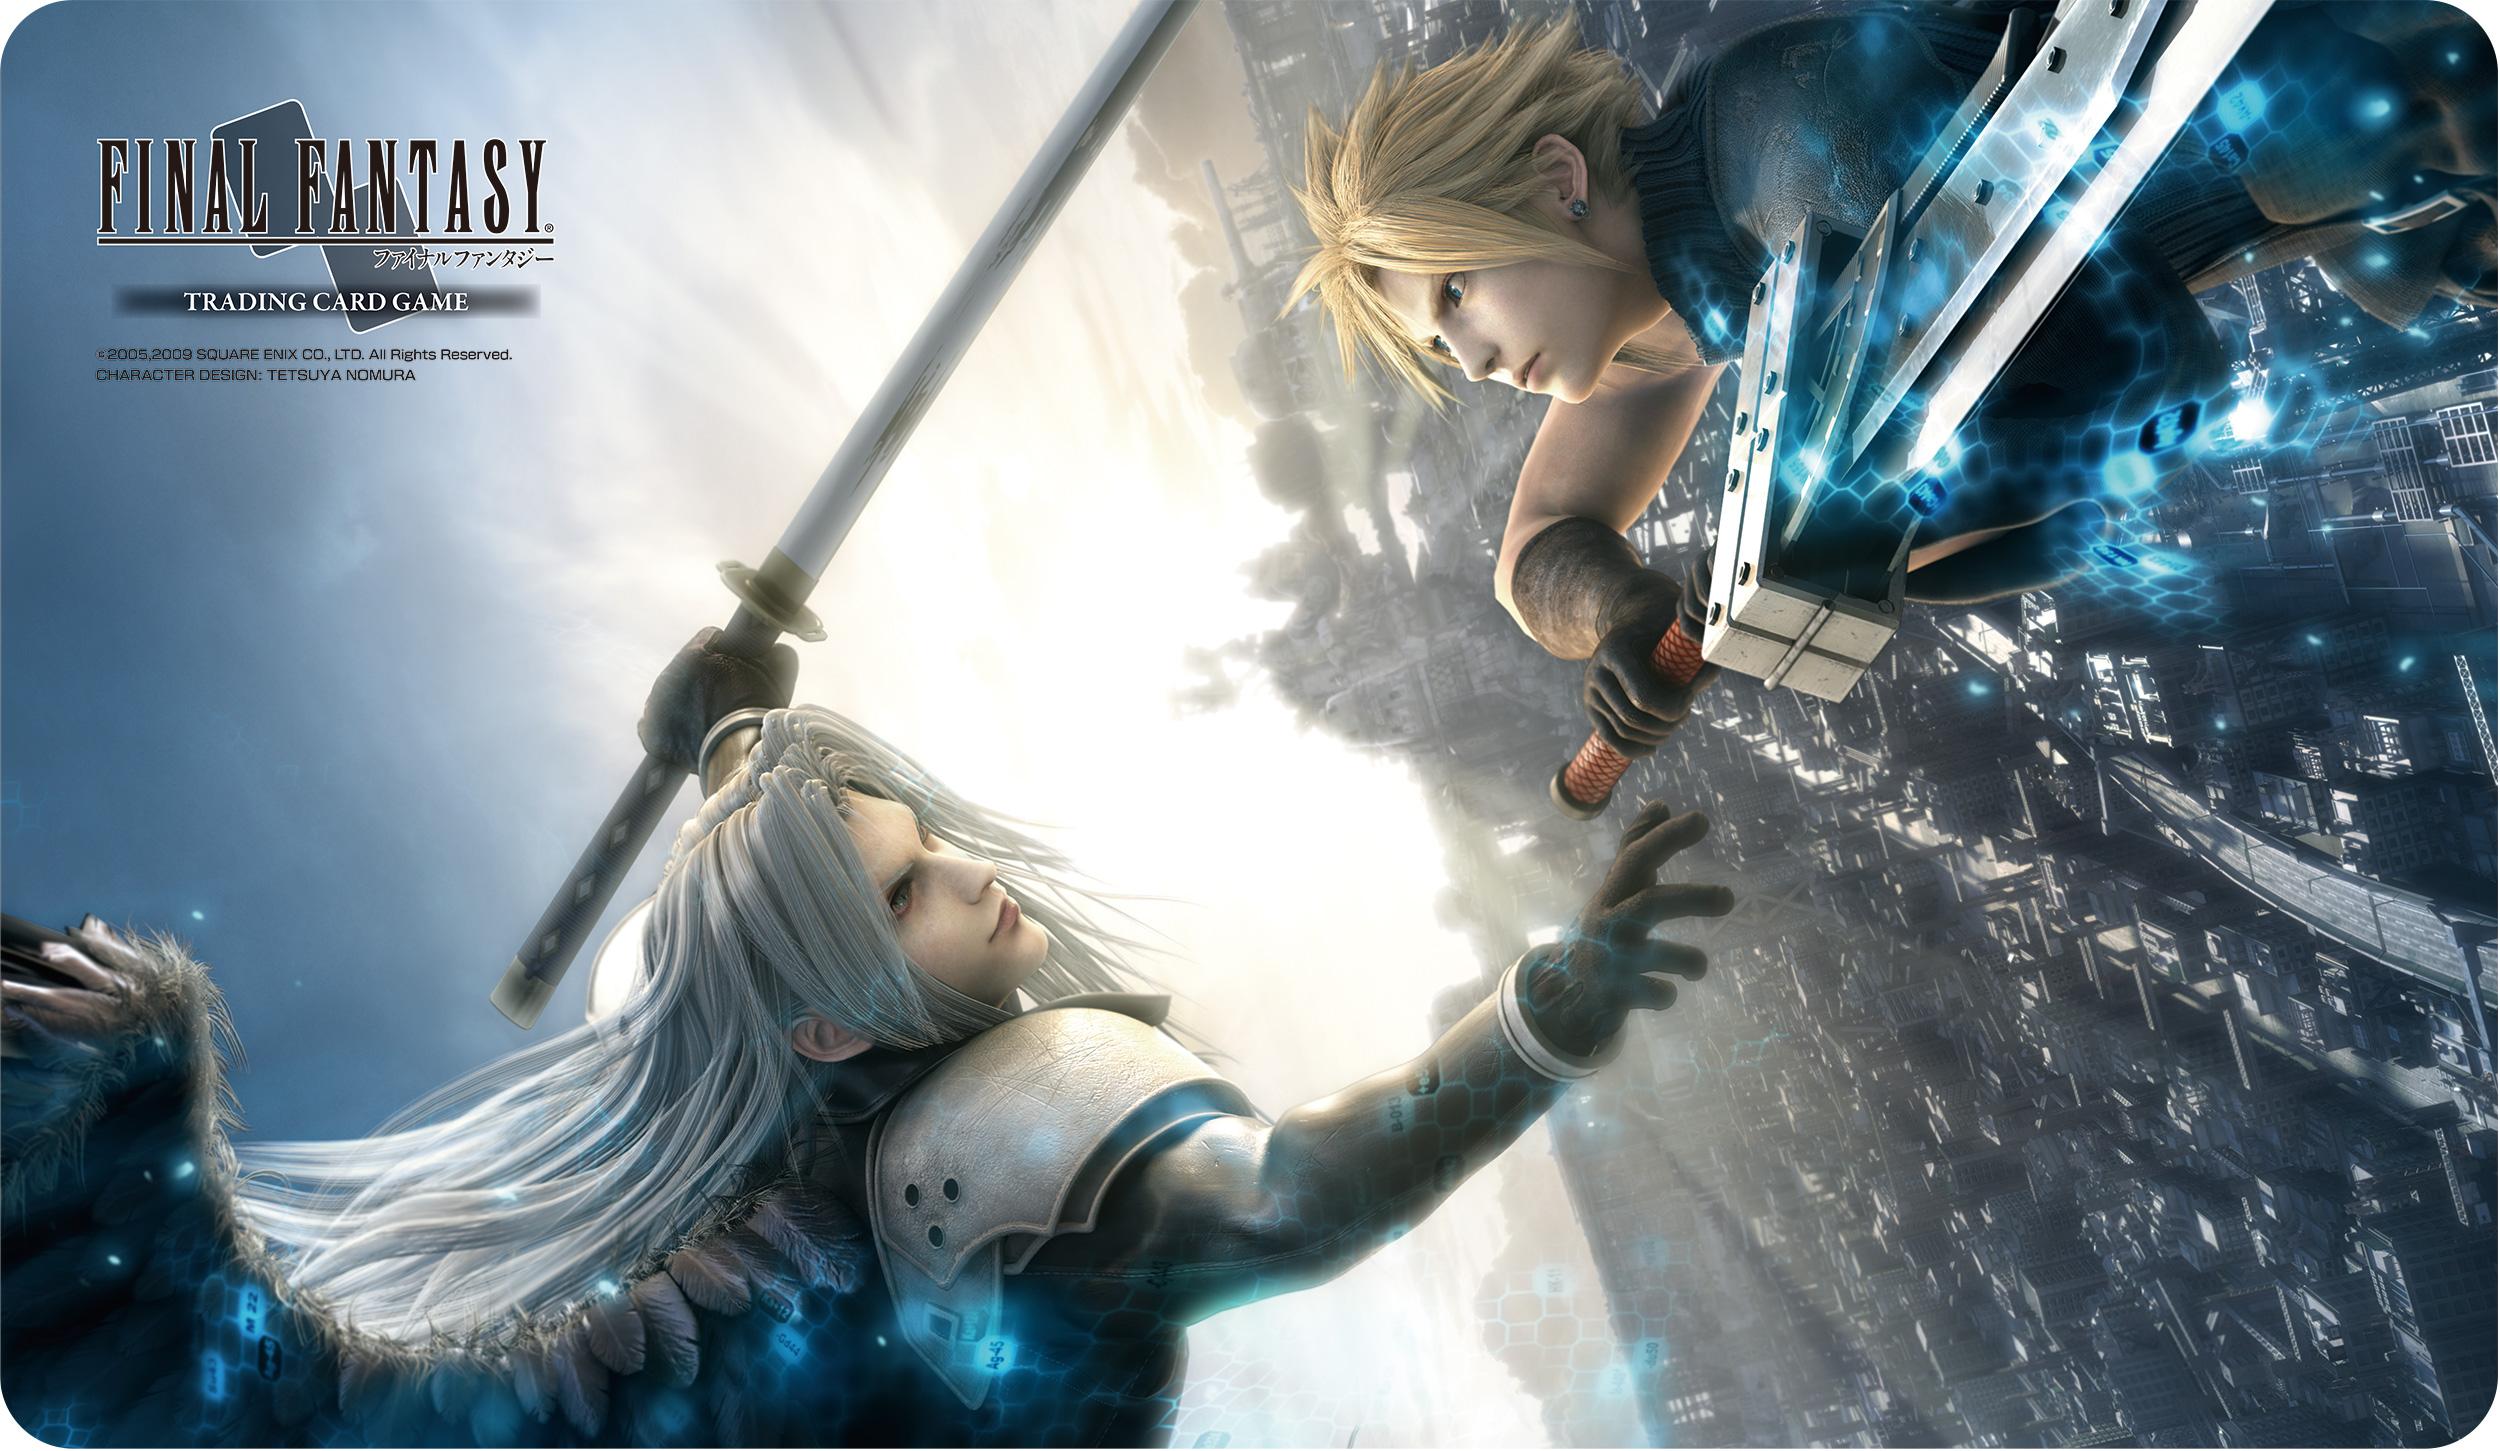 Final Fantasy Saga